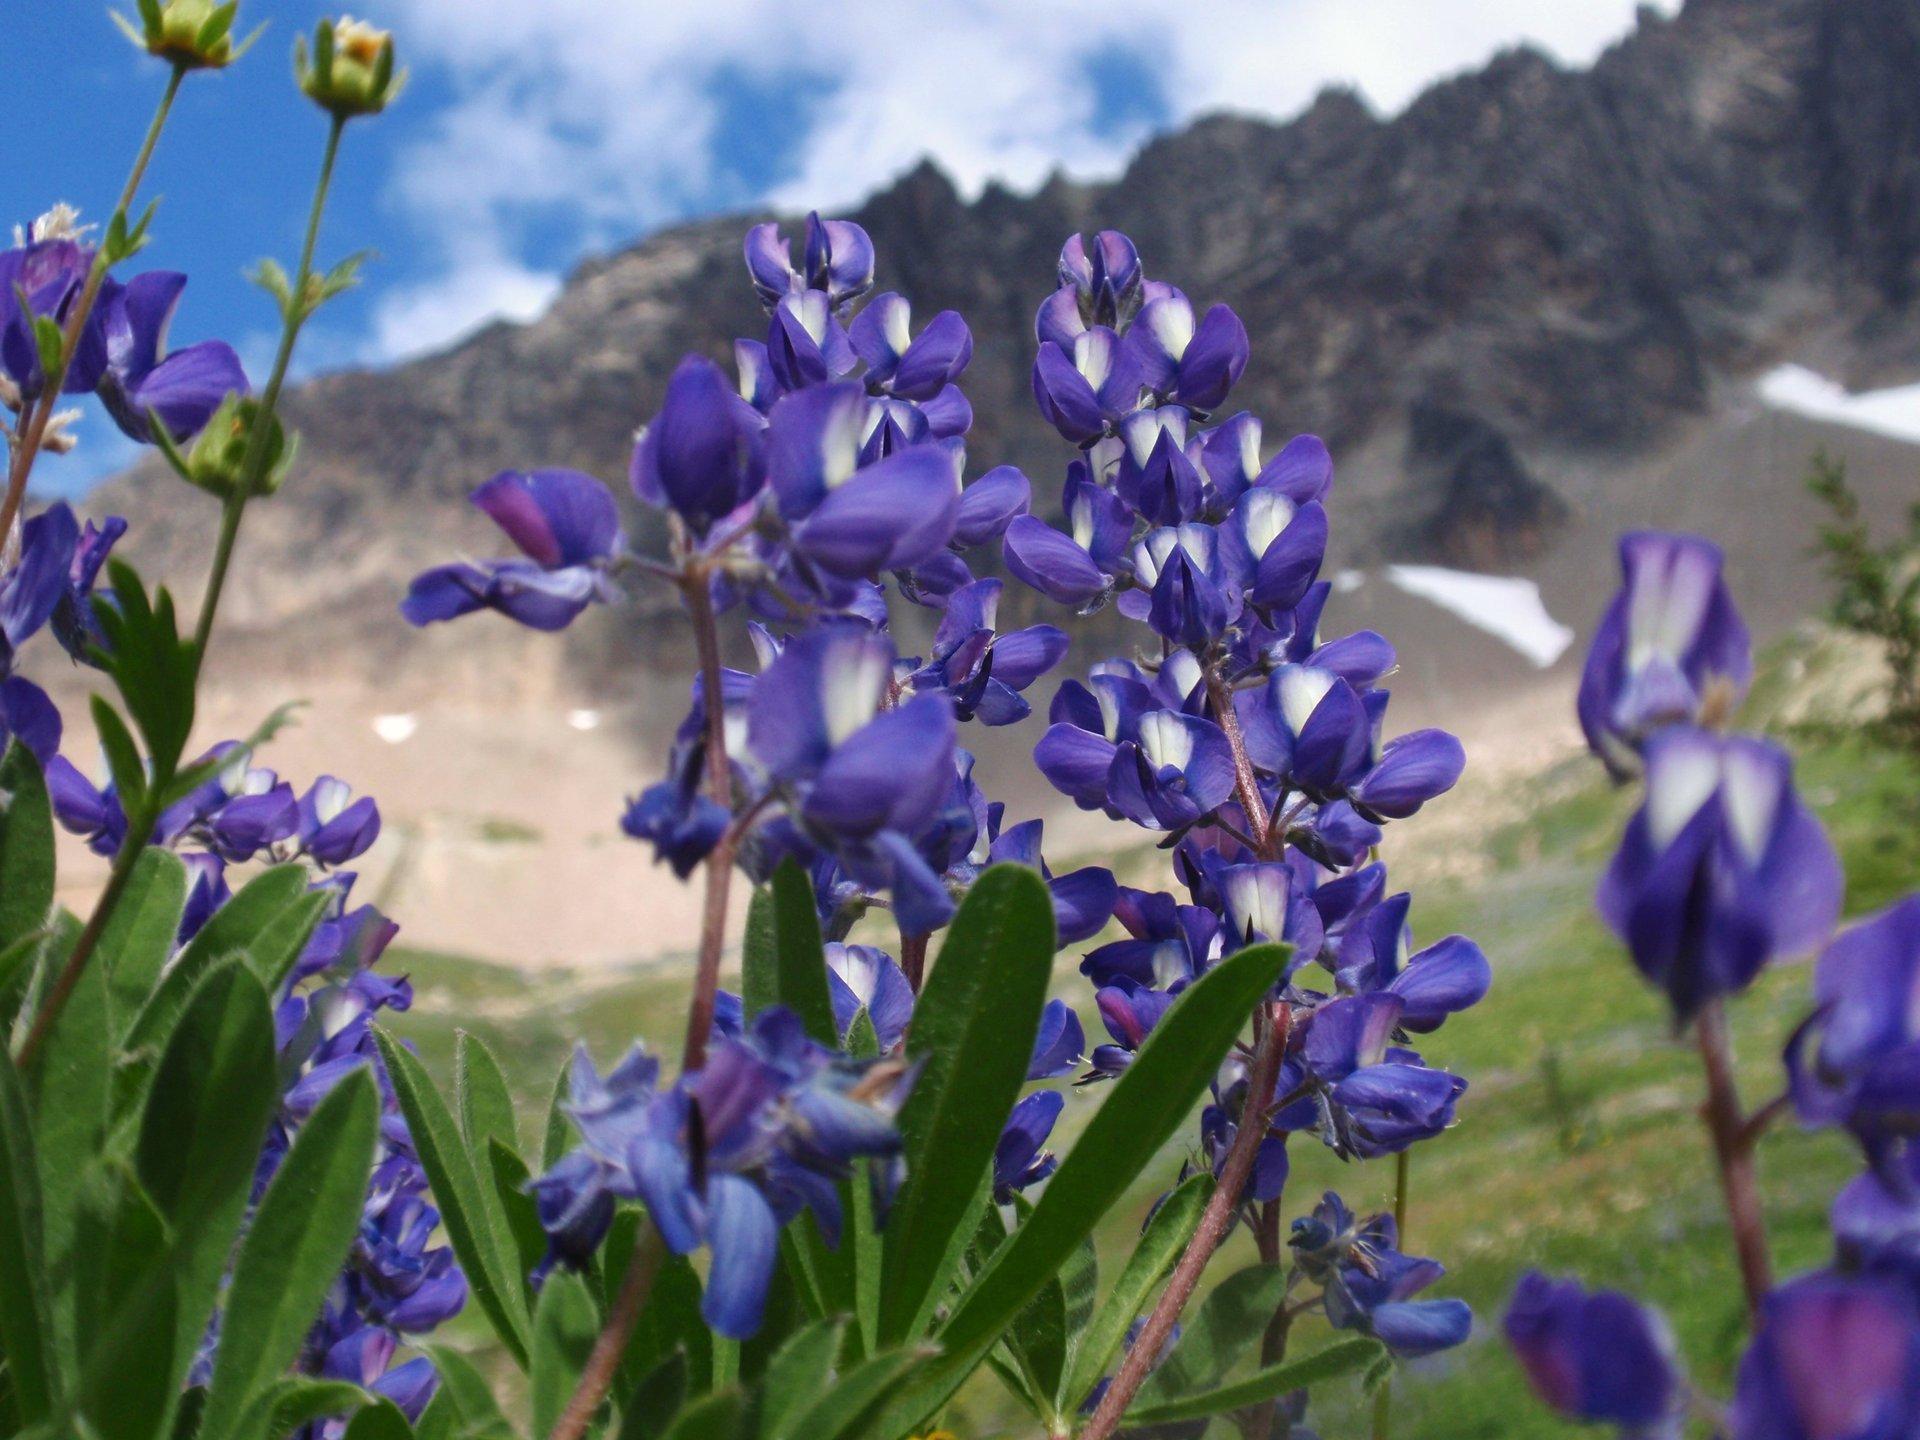 Lupine Bloom in Washington 2020 - Best Time